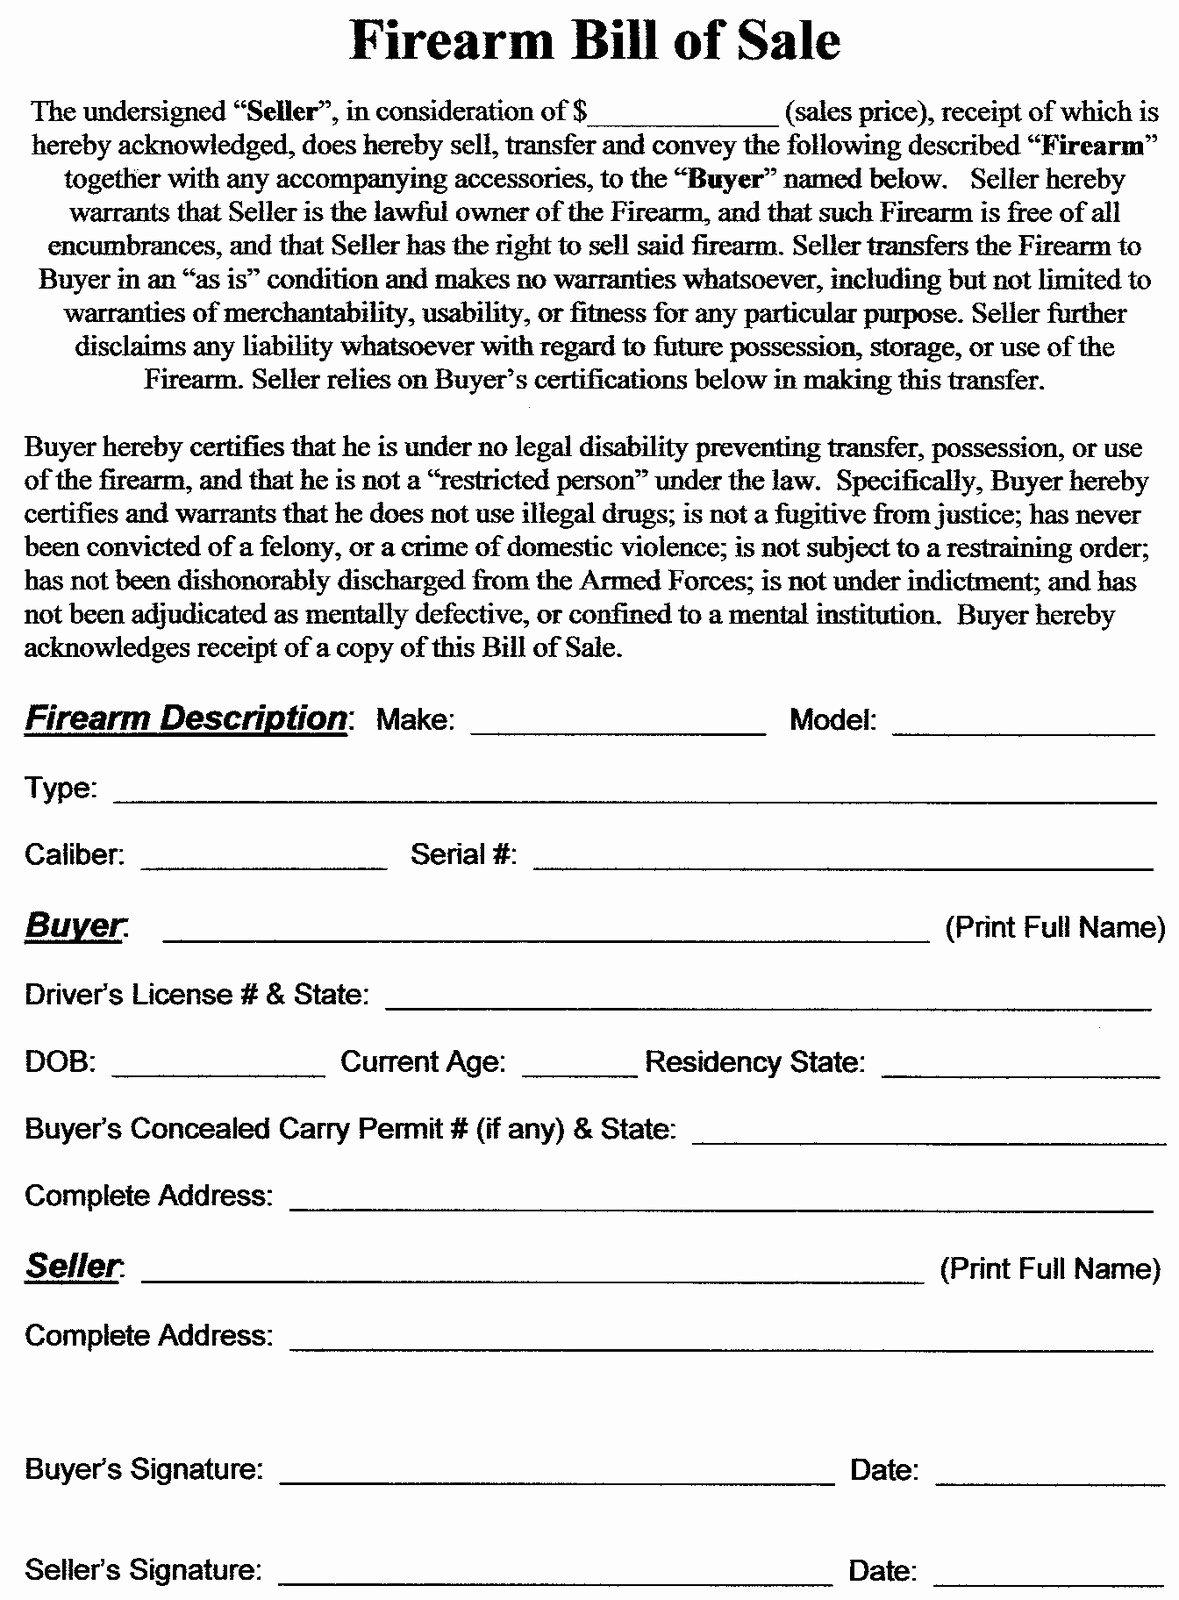 Florida Firearm Bill Of Sale Fresh Utah Concealed Carry Permit